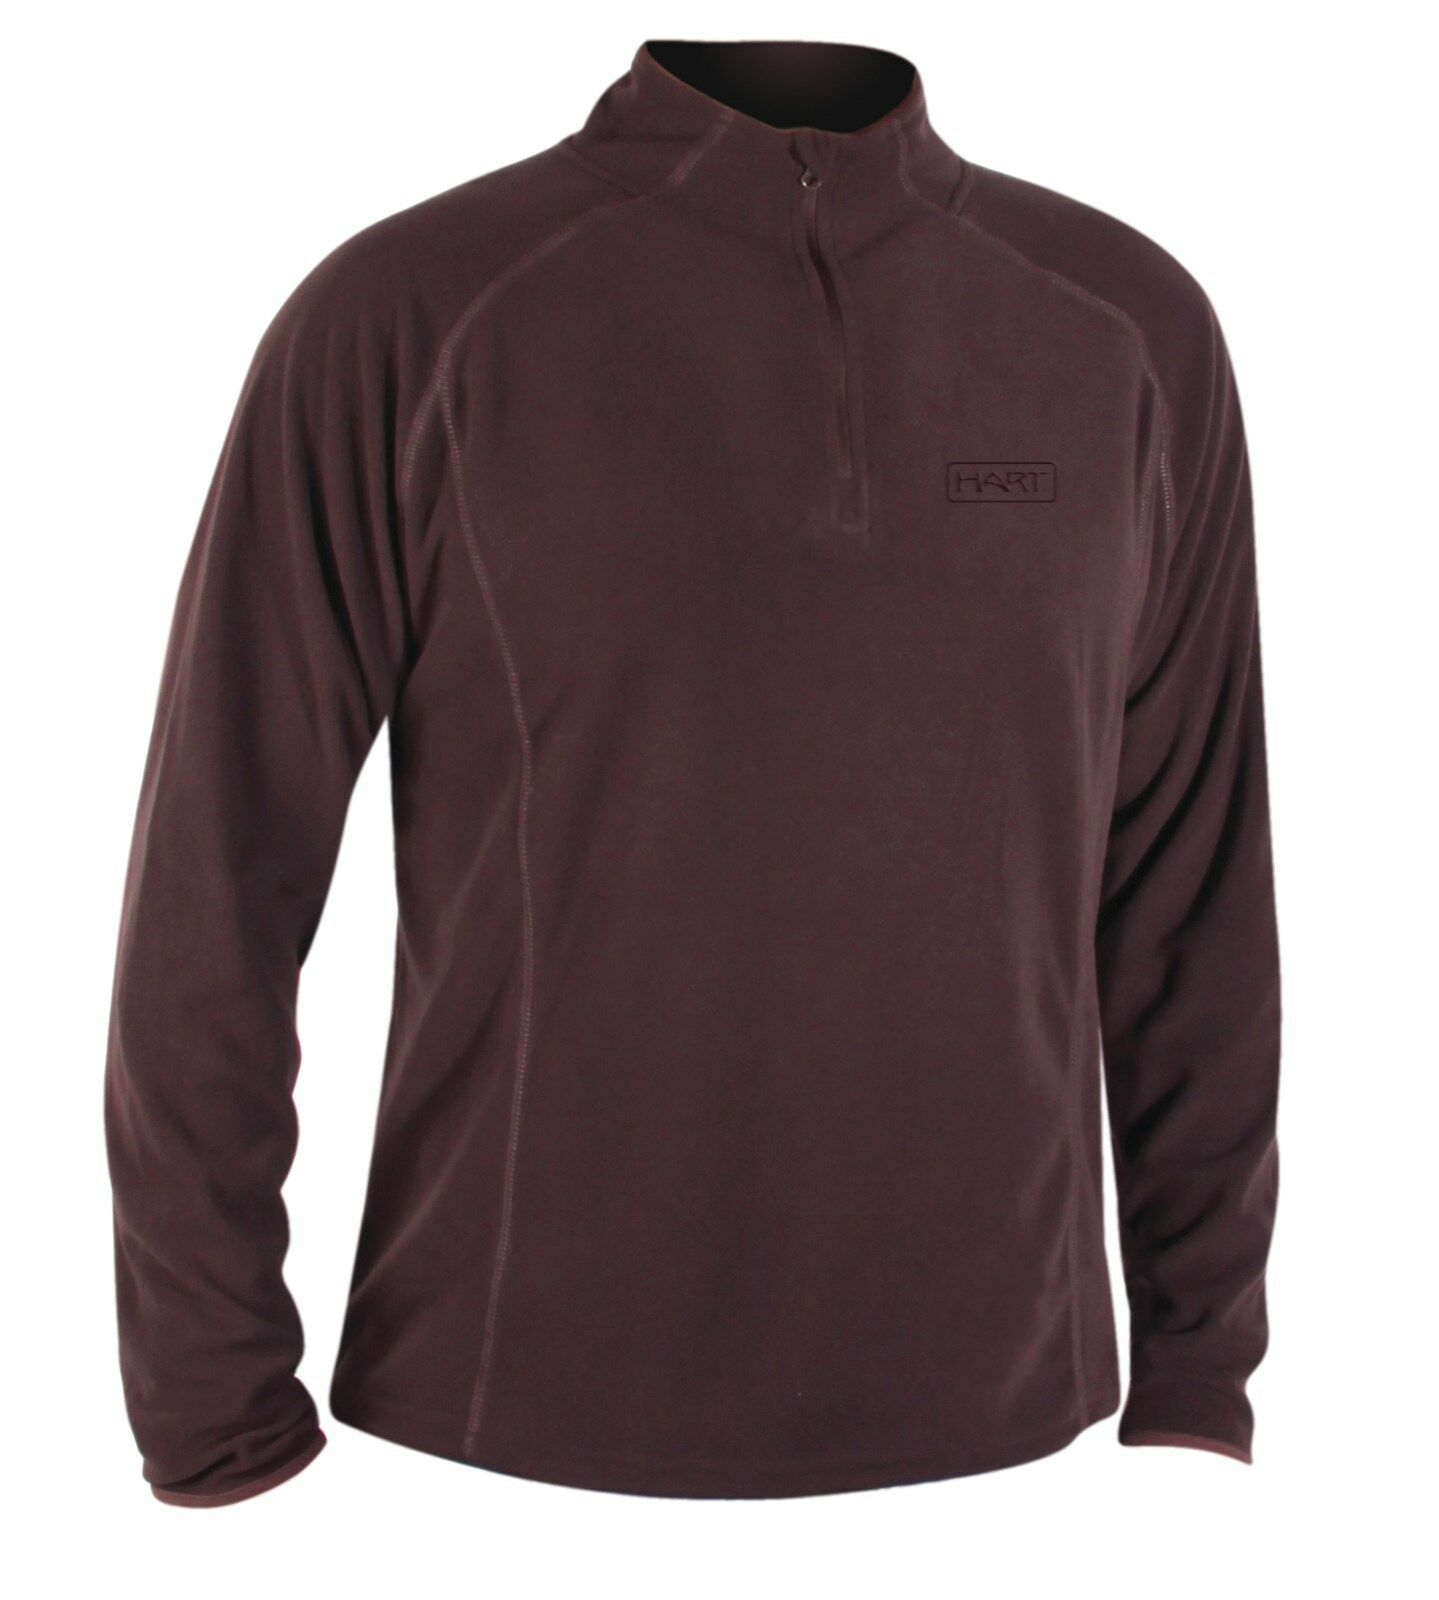 HART - Thermo-Langarm-Fleece INLINER-XT - brown - XHINB